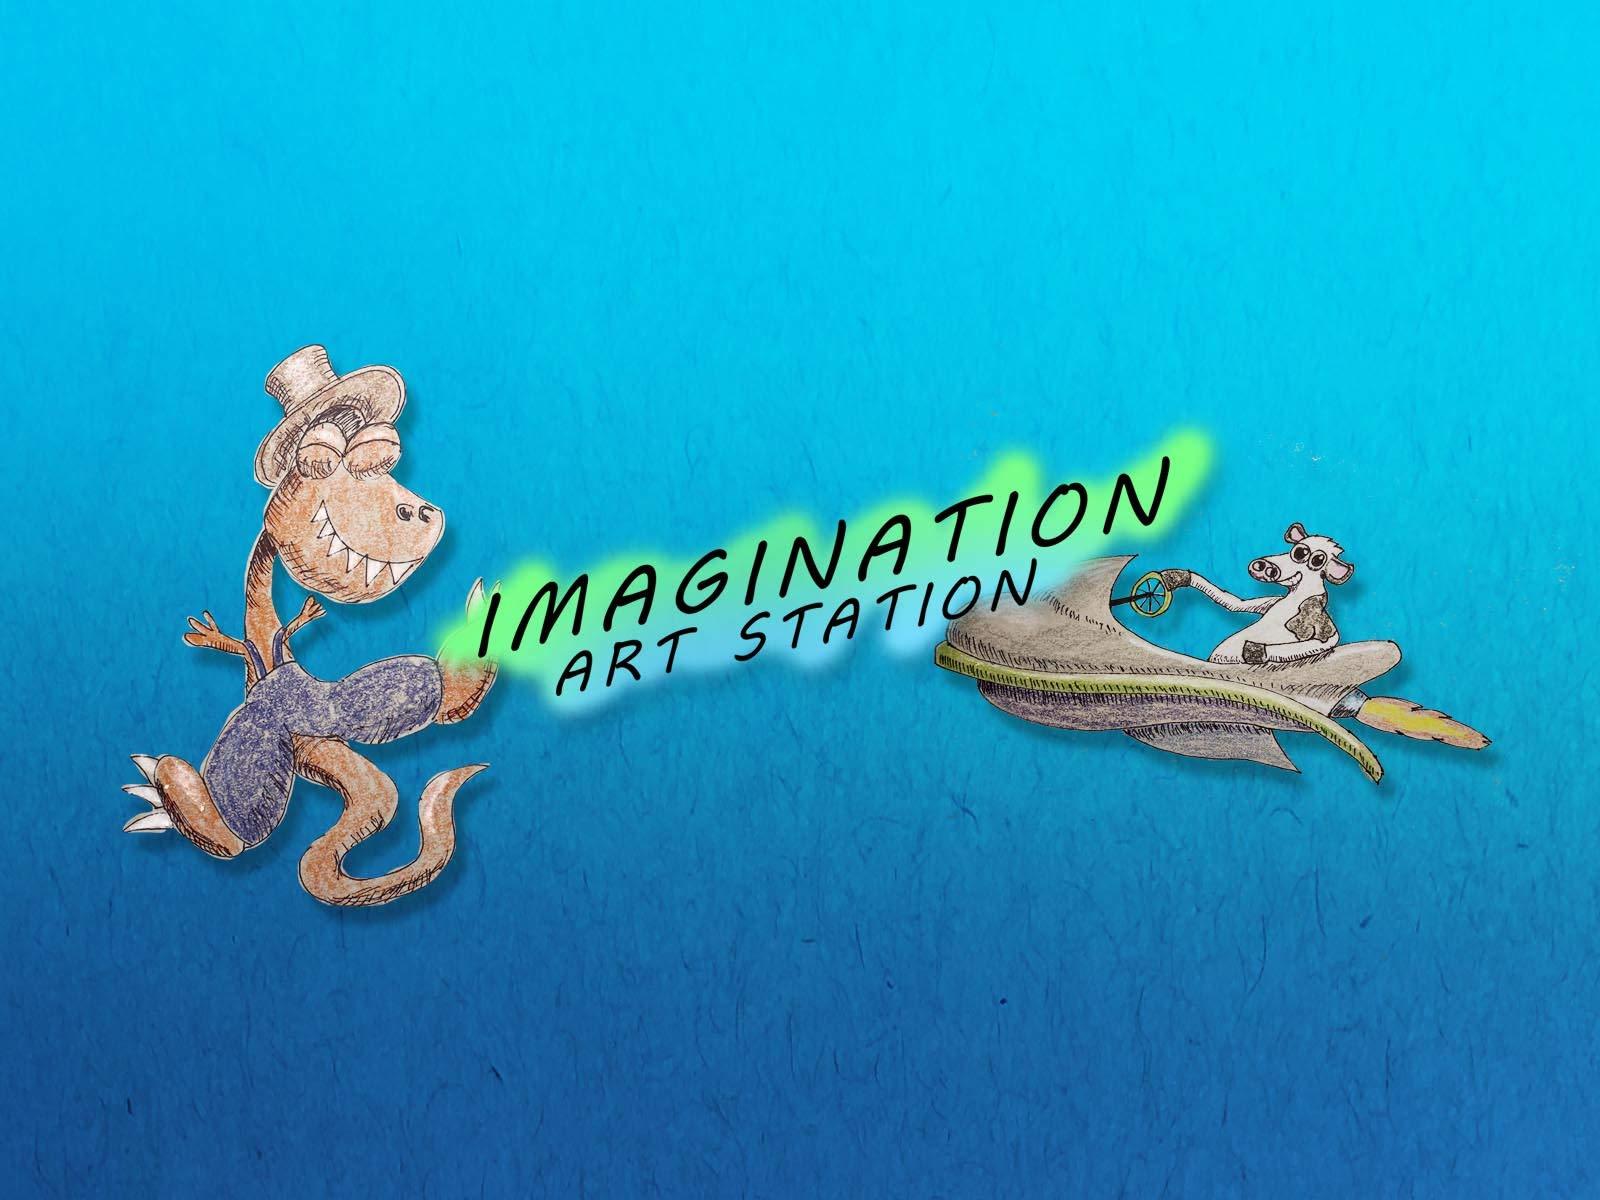 Clip: Imagination Art Station - Season 1